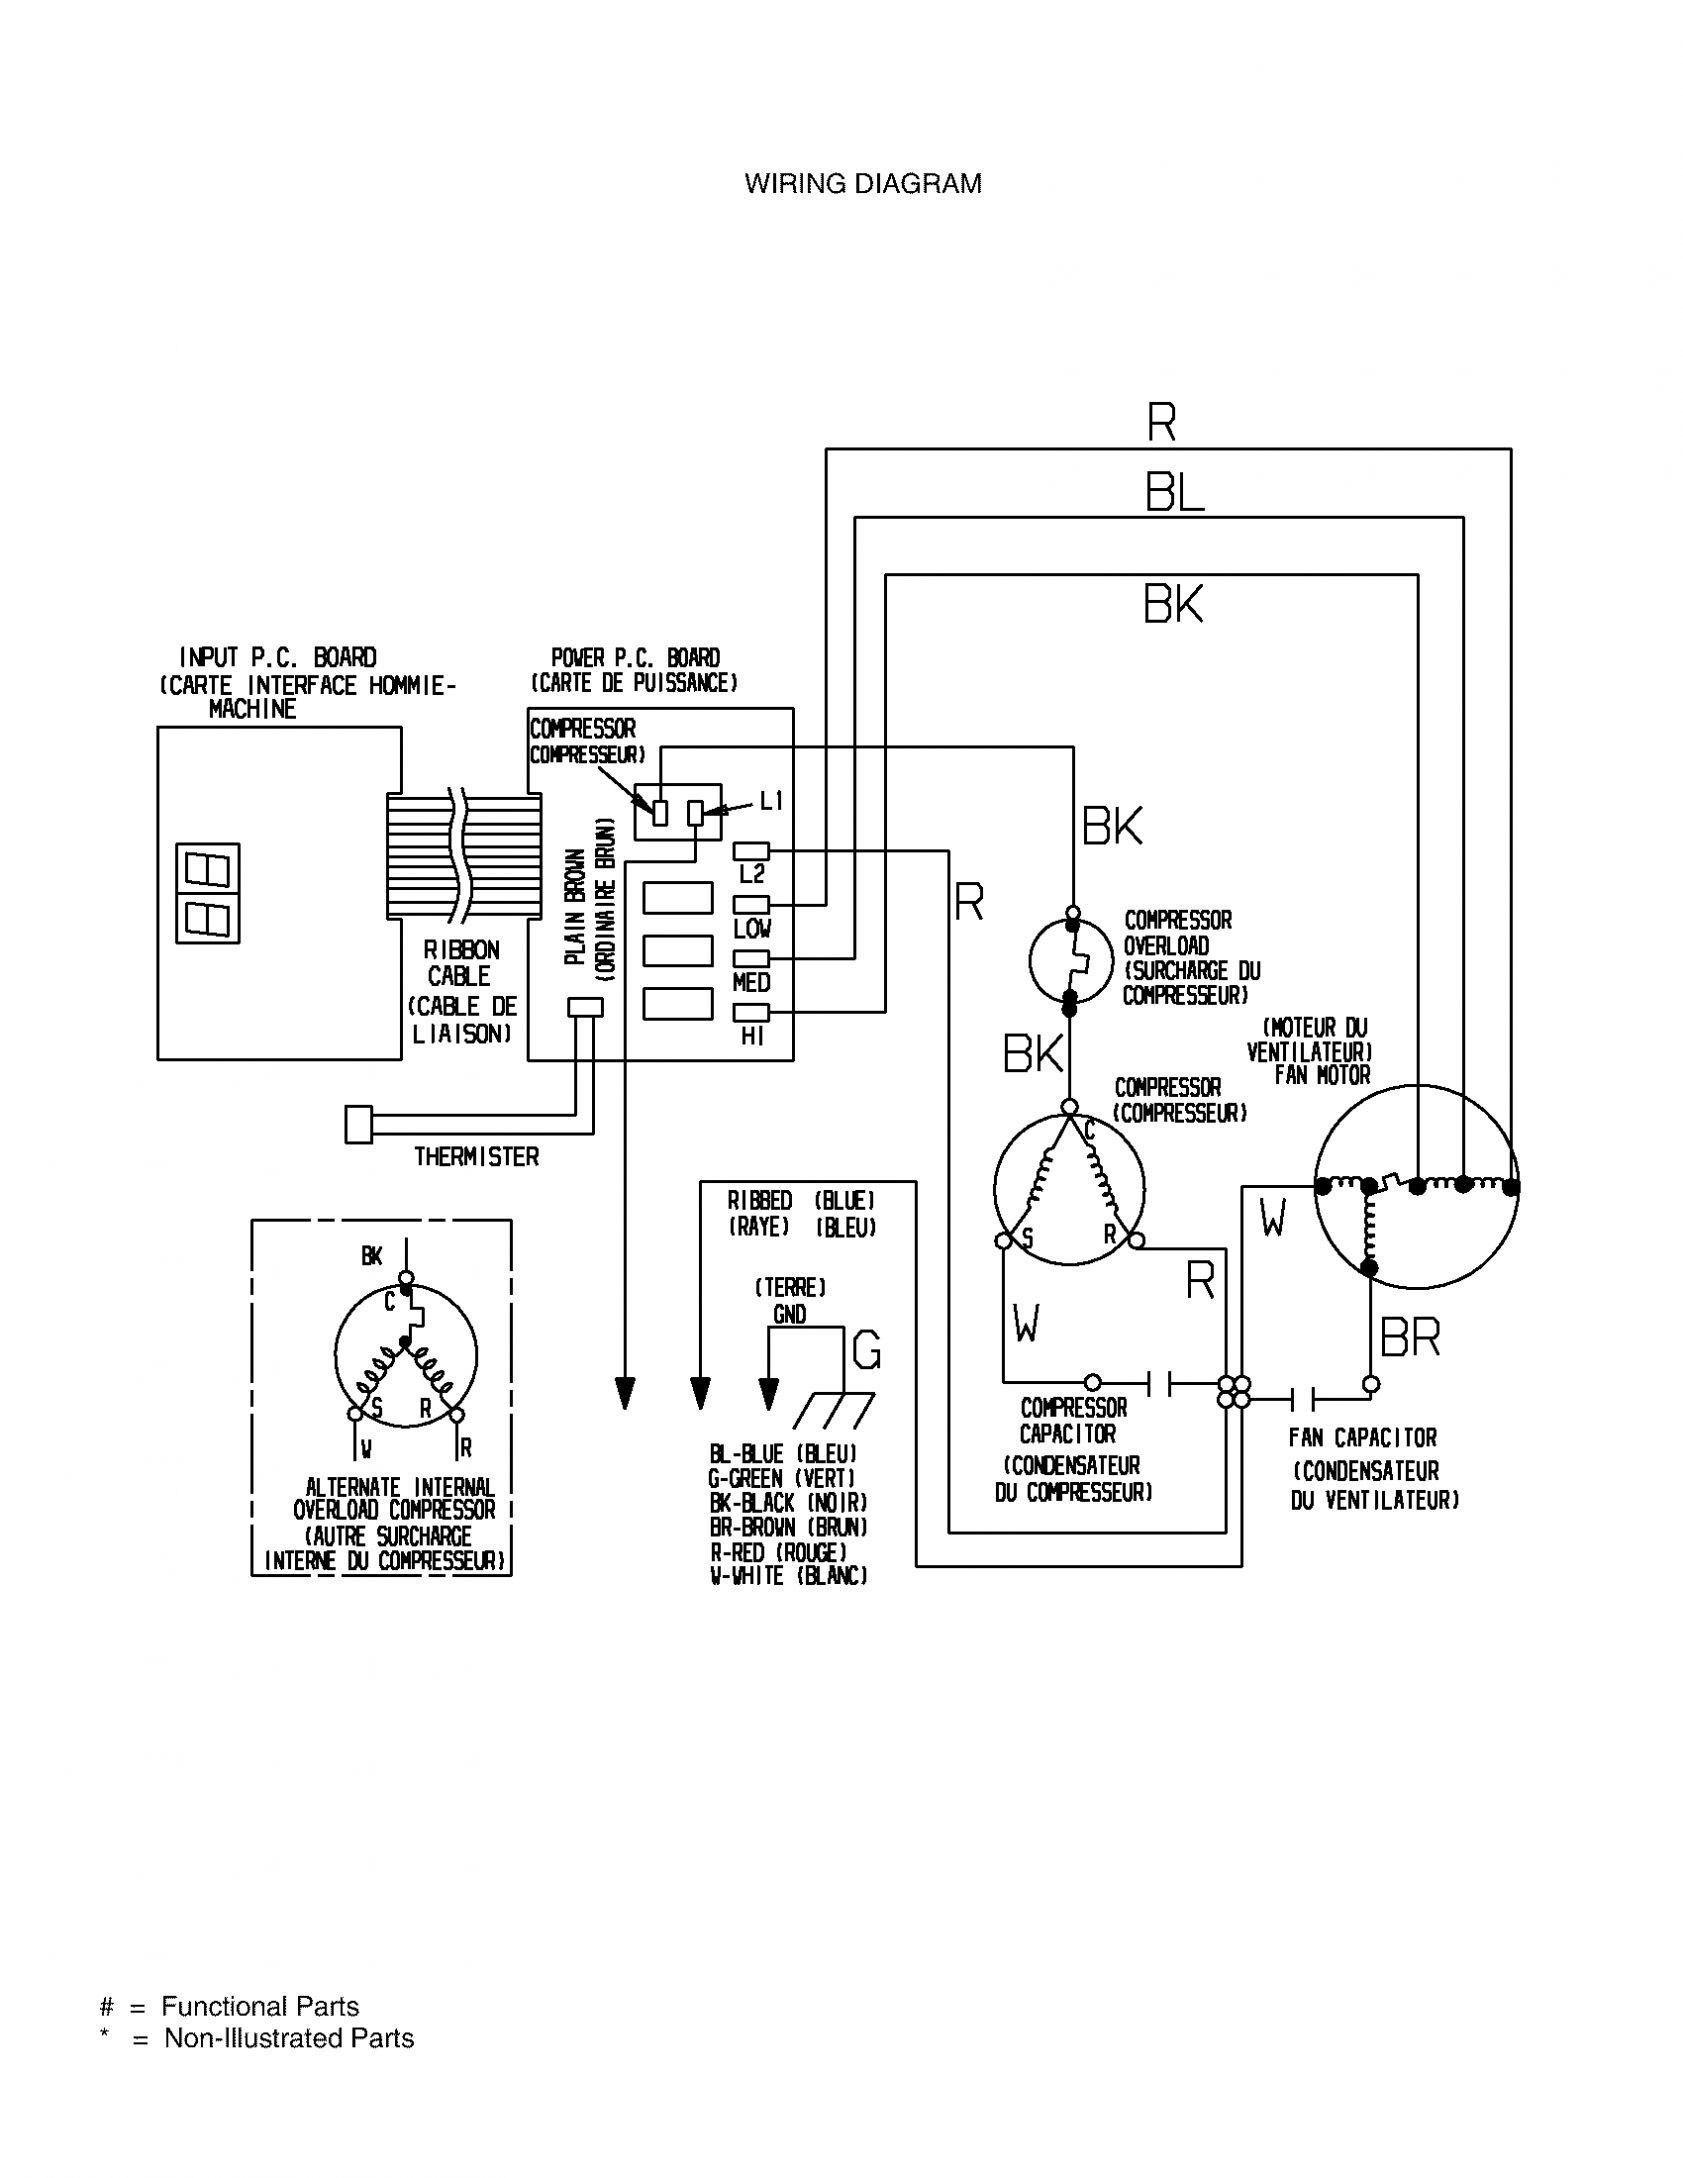 New Ac Ace Wiring Diagram #diagram #diagramtemplate #diagramsample |  Diagrama de circuito, CircuitoPinterest